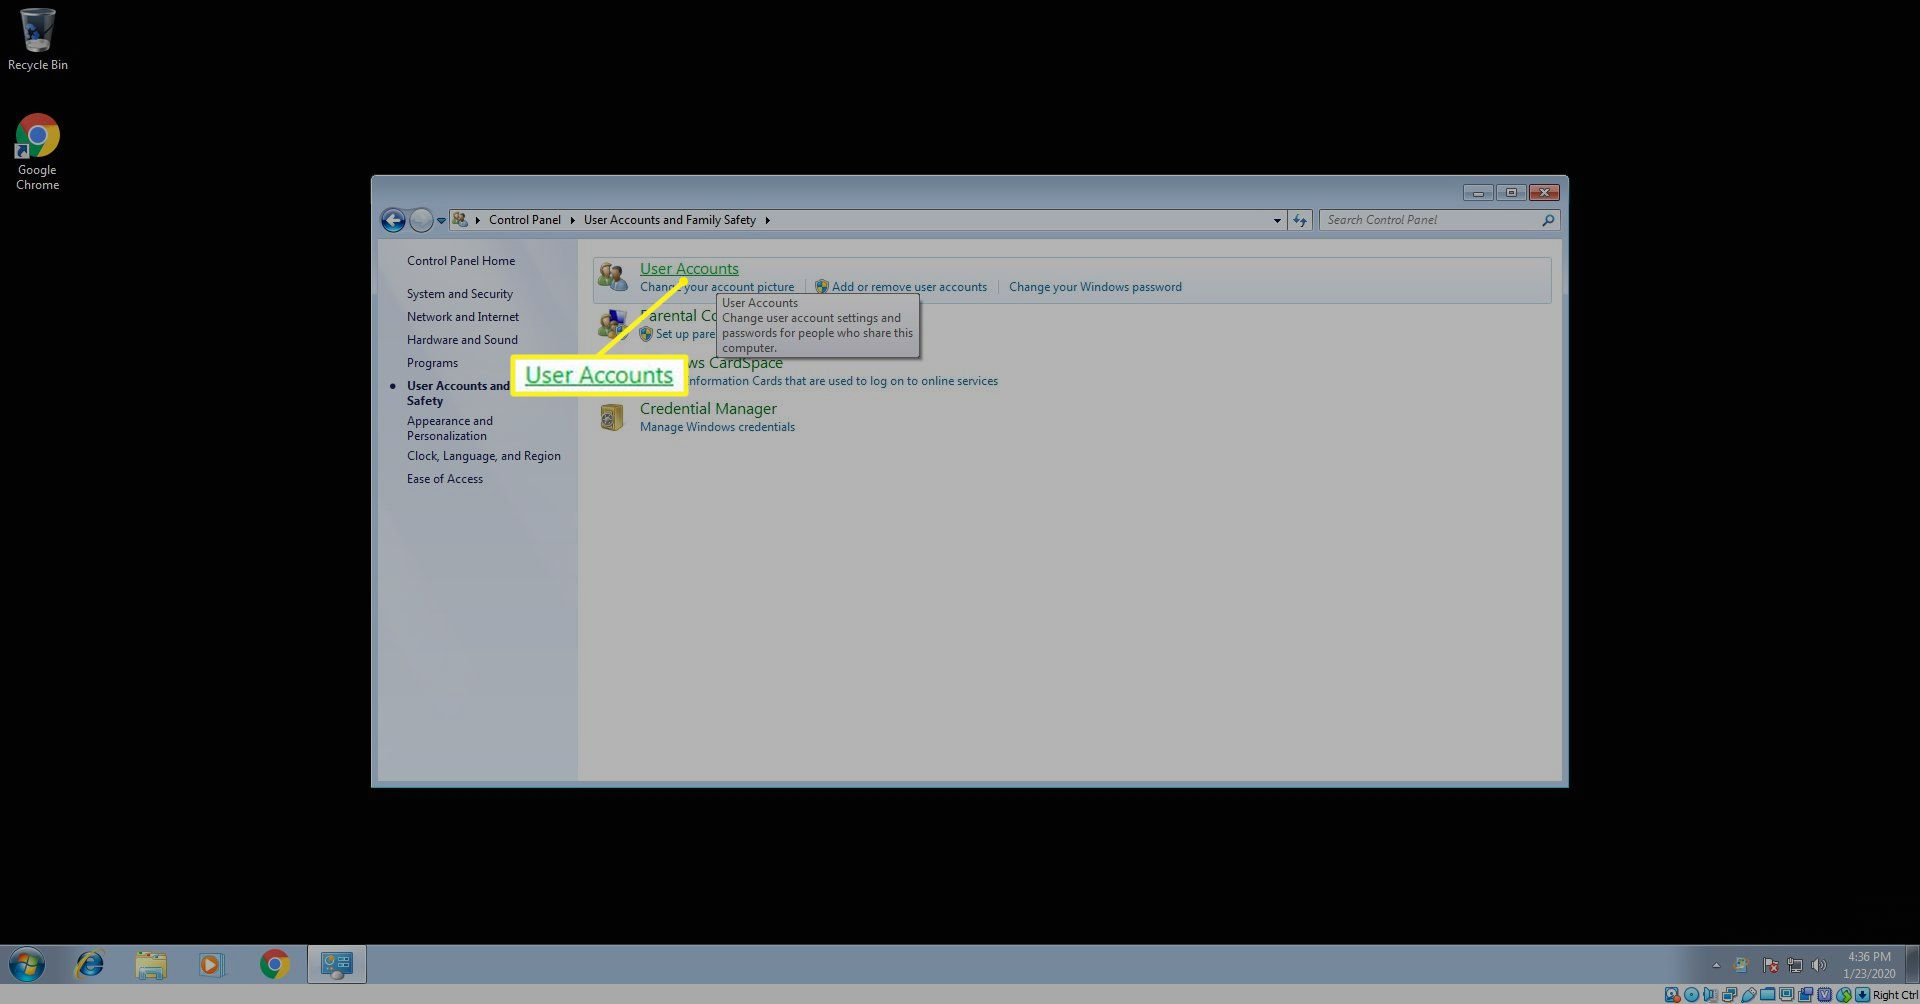 User Accounts in Windows 7